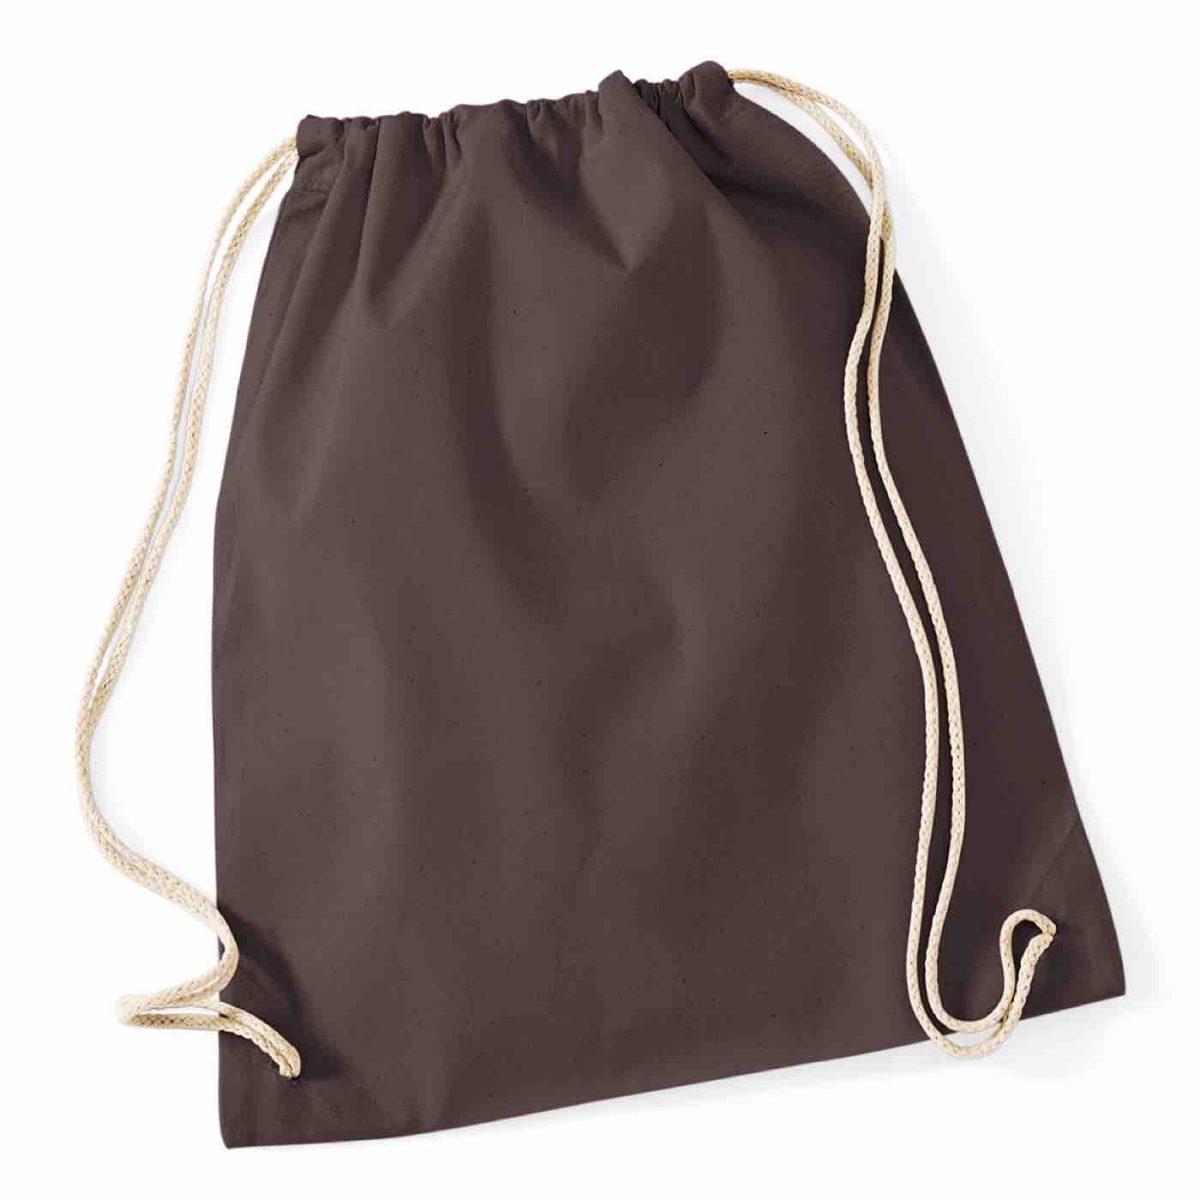 Chocolate Cotton Tote Bag